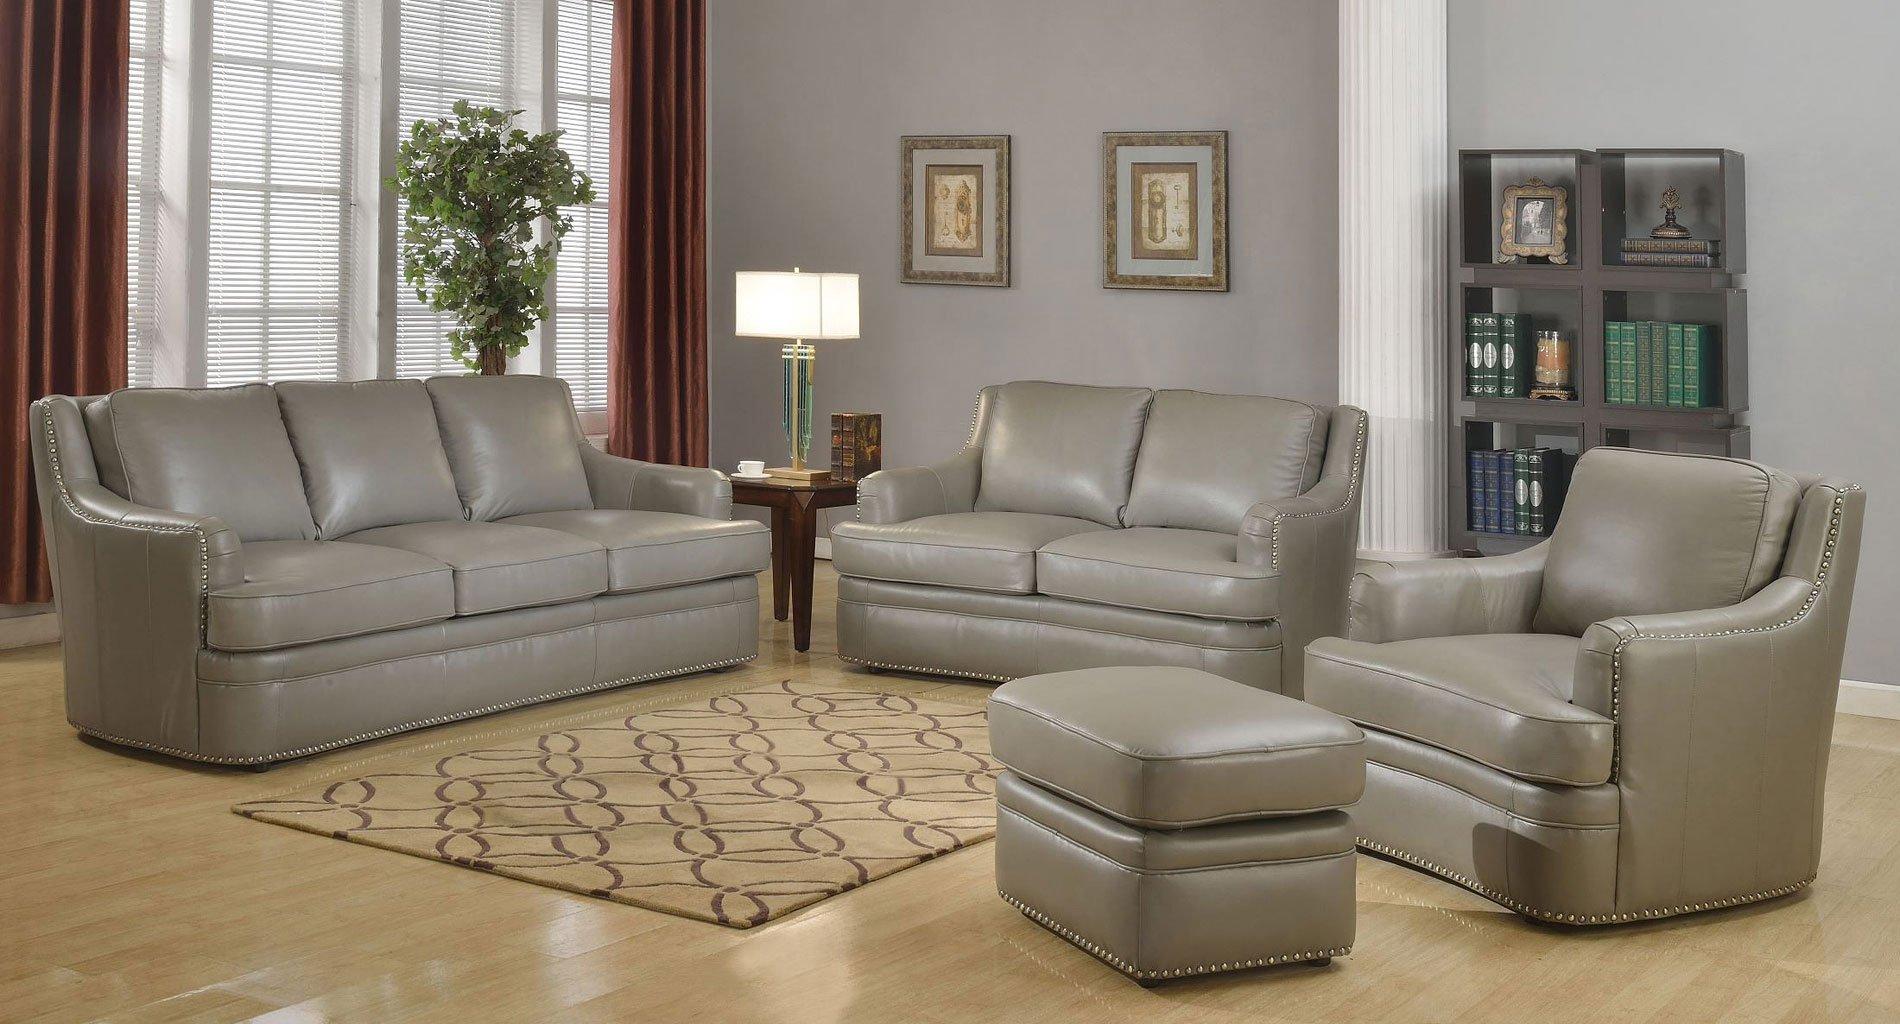 leather sofas in tulsa ok flexsteel conversation sofa living room set italia furniture cart